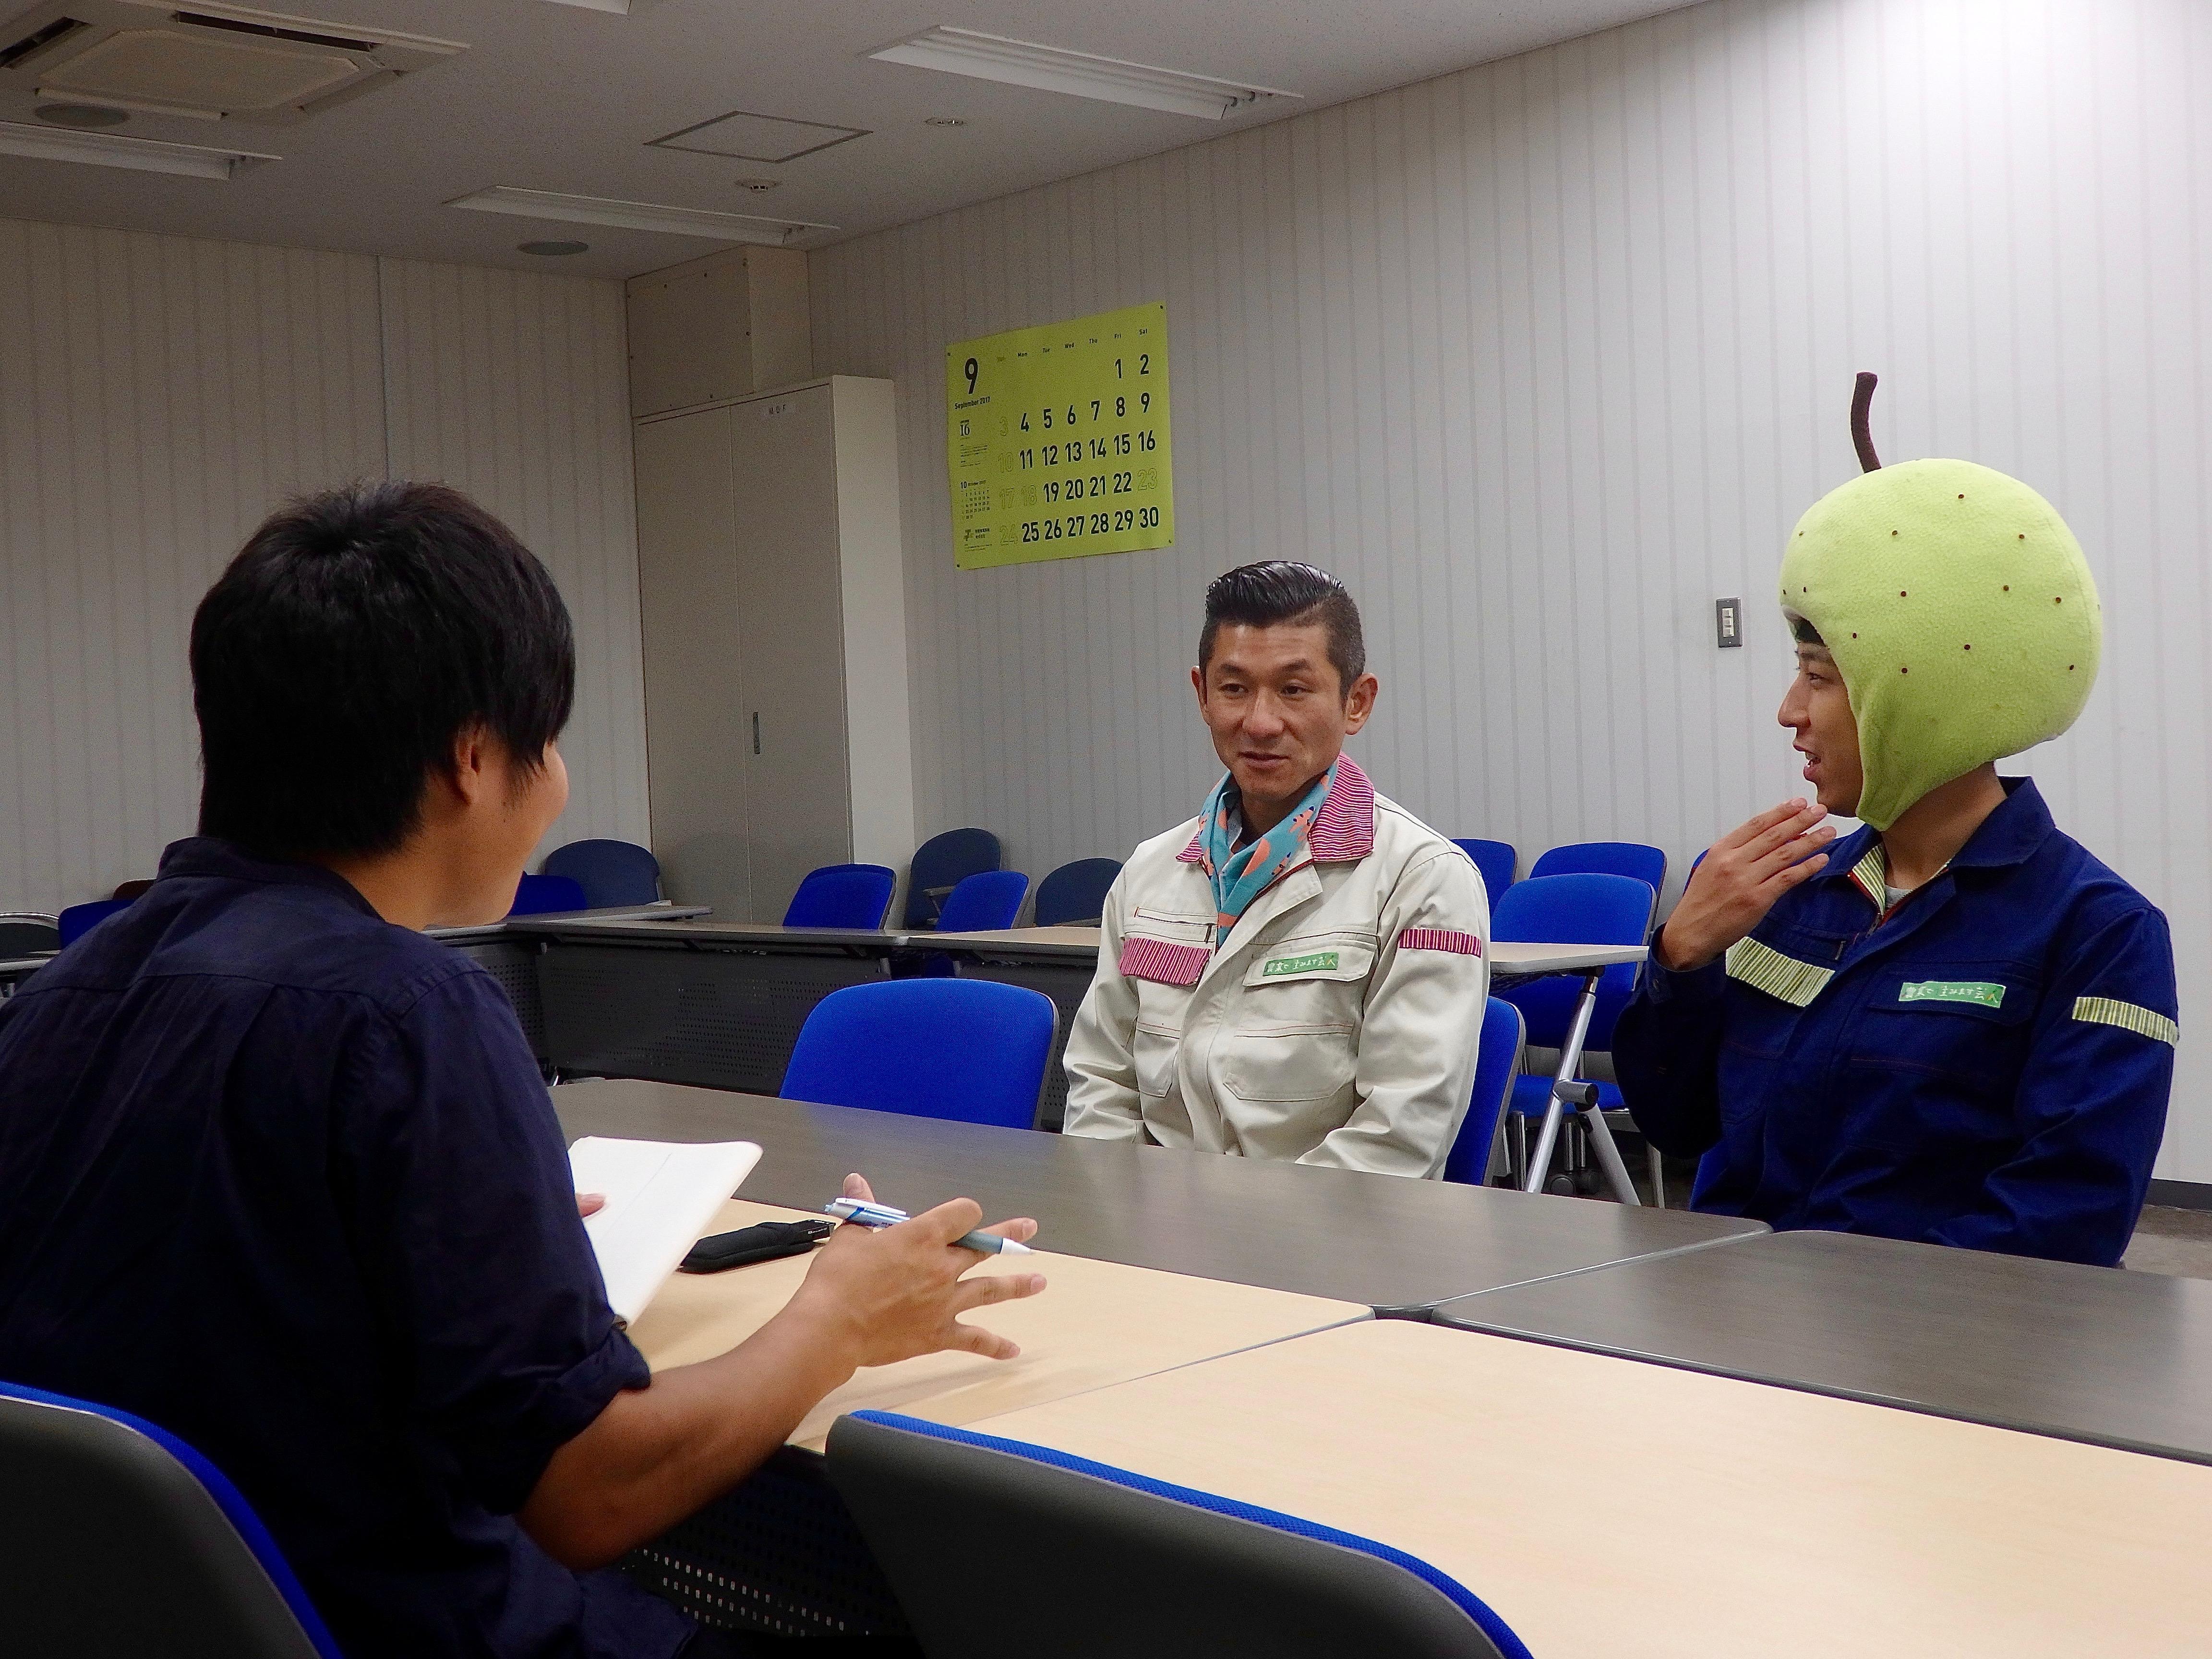 http://news.yoshimoto.co.jp/20170907230214-f93e2f97bd4a9a6654878c2eaa37b2aeae6c453a.jpg